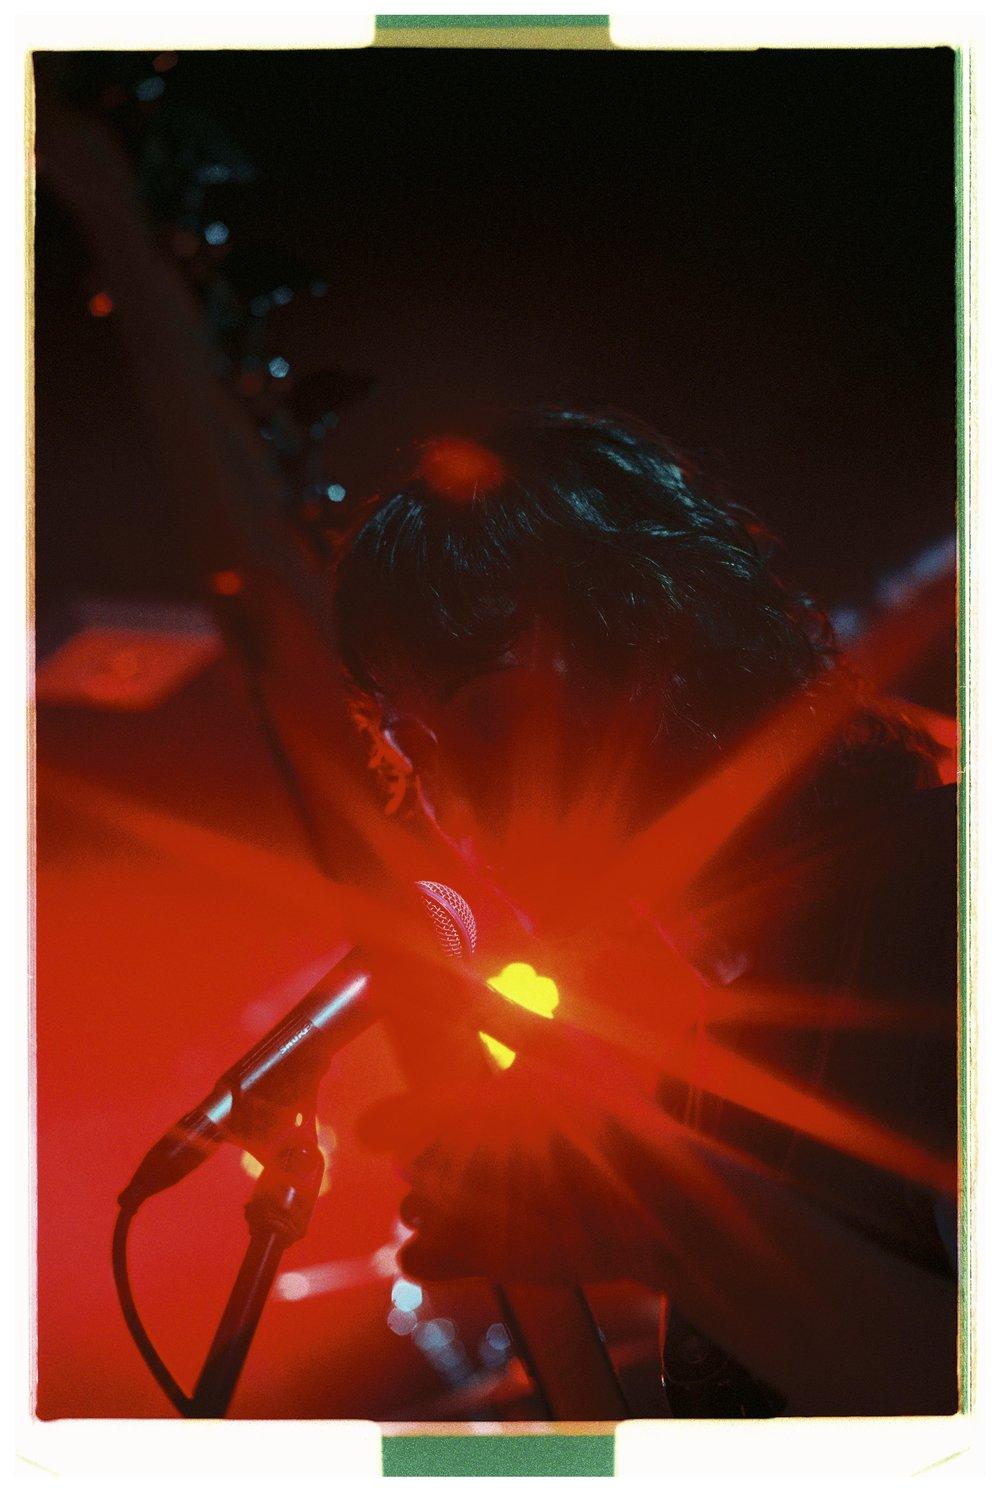 Bloods - Dylan Bow - 15.jpg